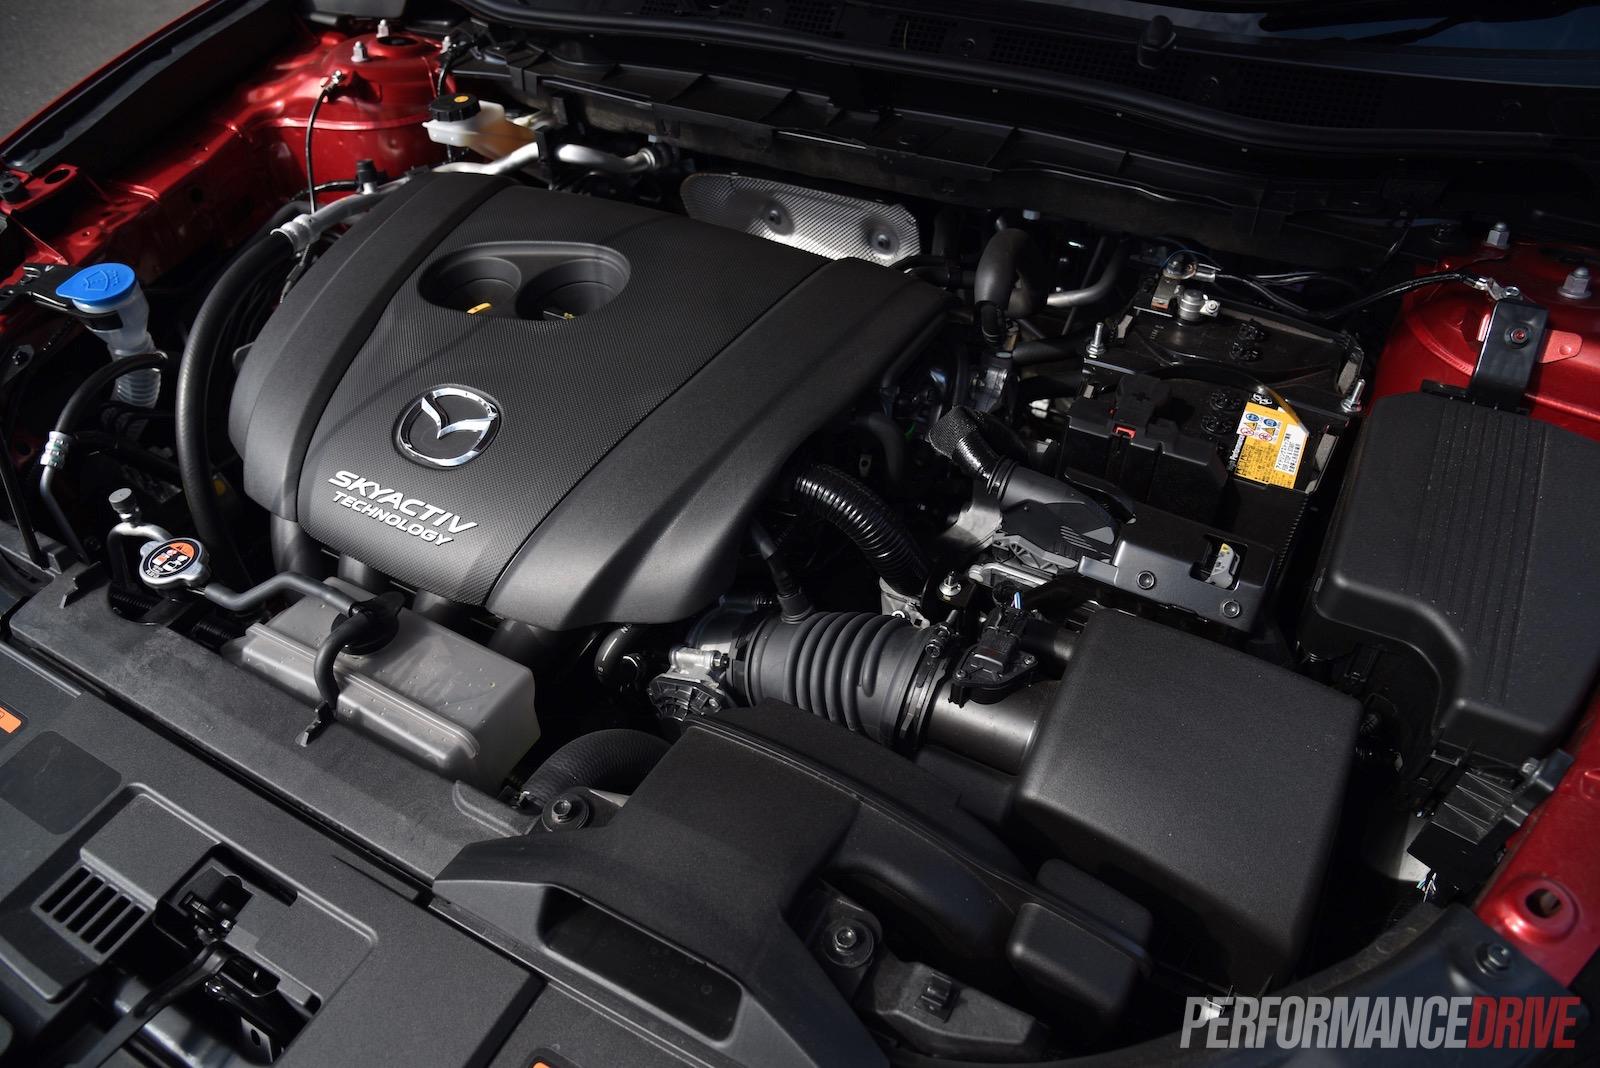 2015 Mazda CX-5 2.5L engine |